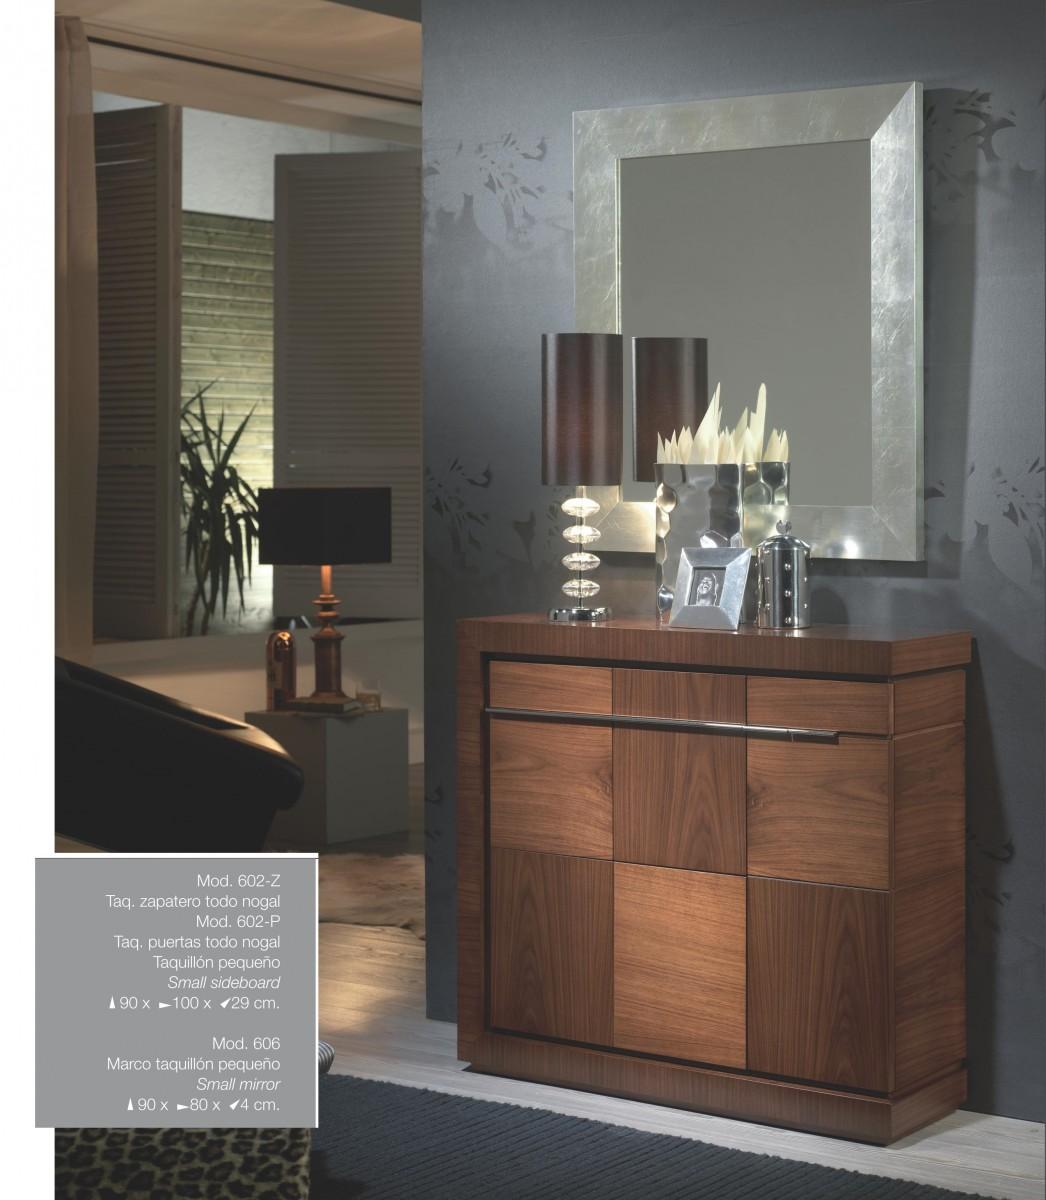 Mueble zapatero recibidor clasico colonial madera dise o 667 602 z muebles valencia - Mueble colonial valencia ...